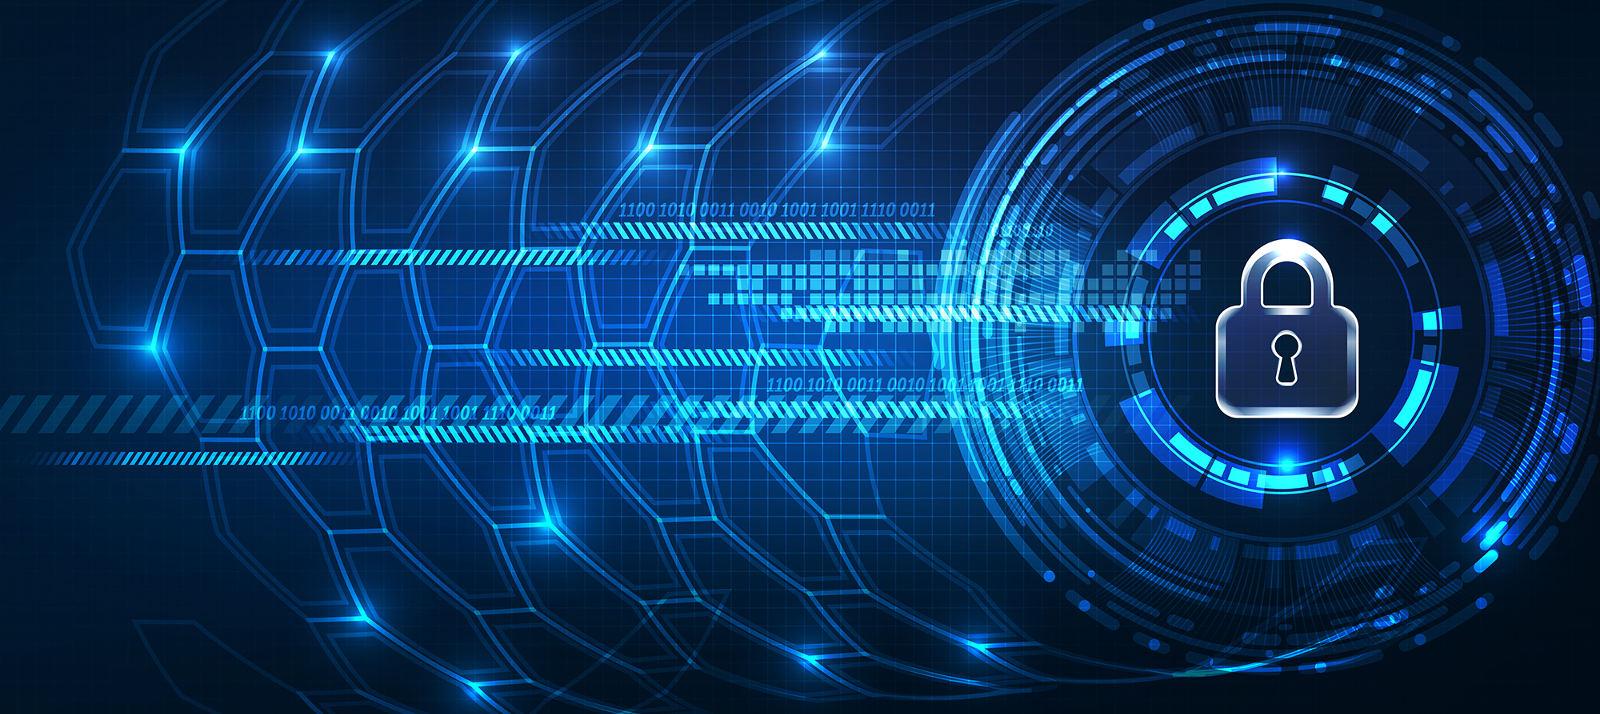 VPN для Android — обход блокировок и смена IP